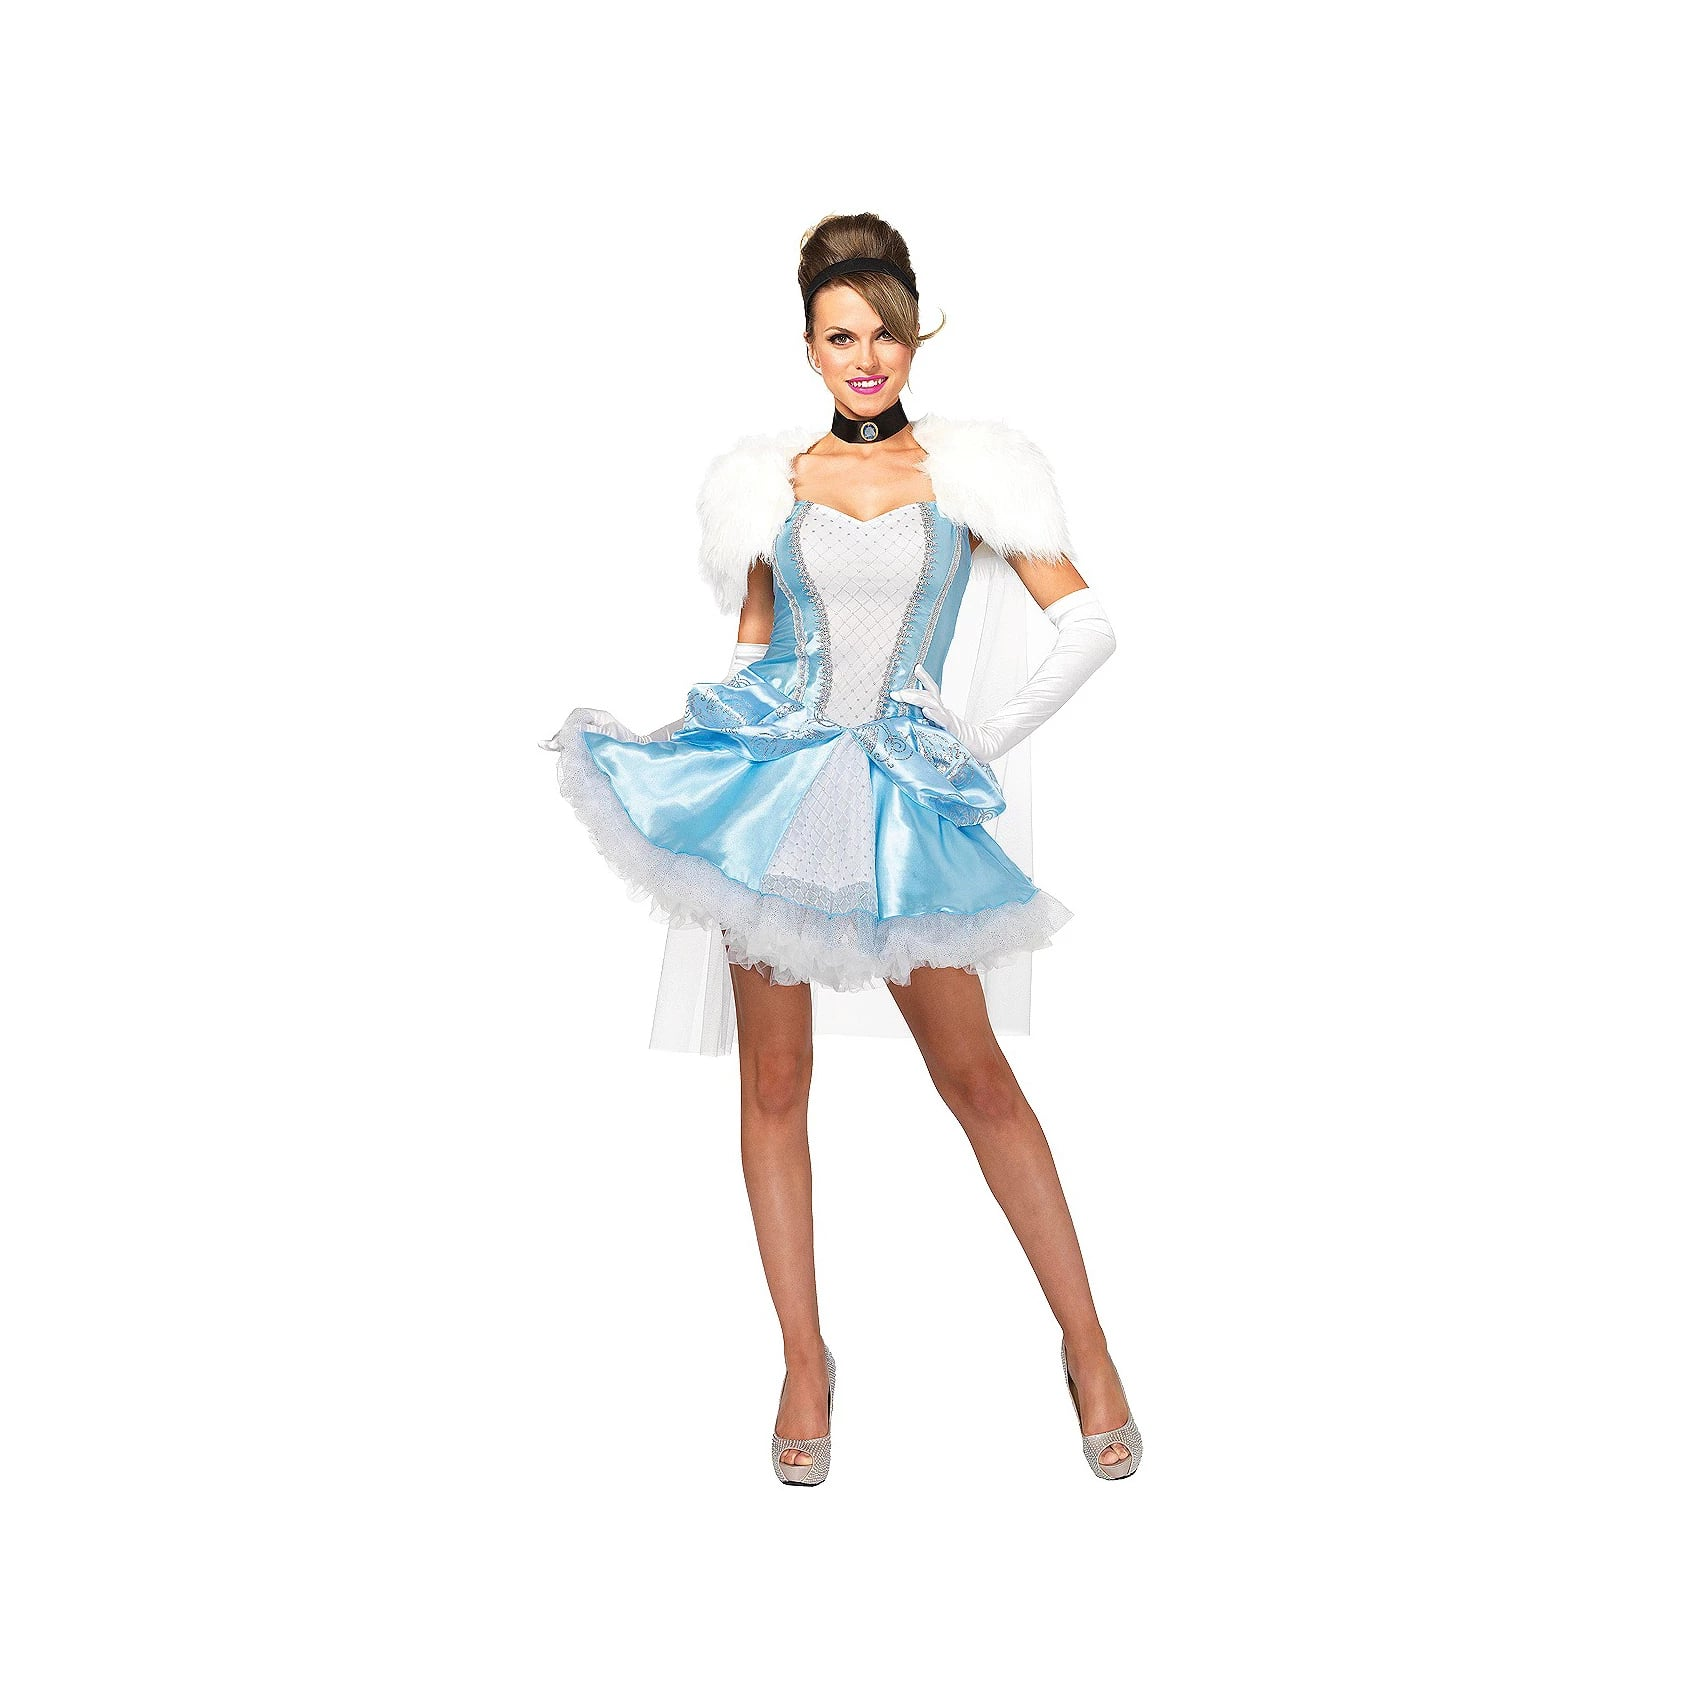 Halloween Costumes For Women Princess.Sexy Halloween Costumes To Buy 2020 Popsugar Love Sex